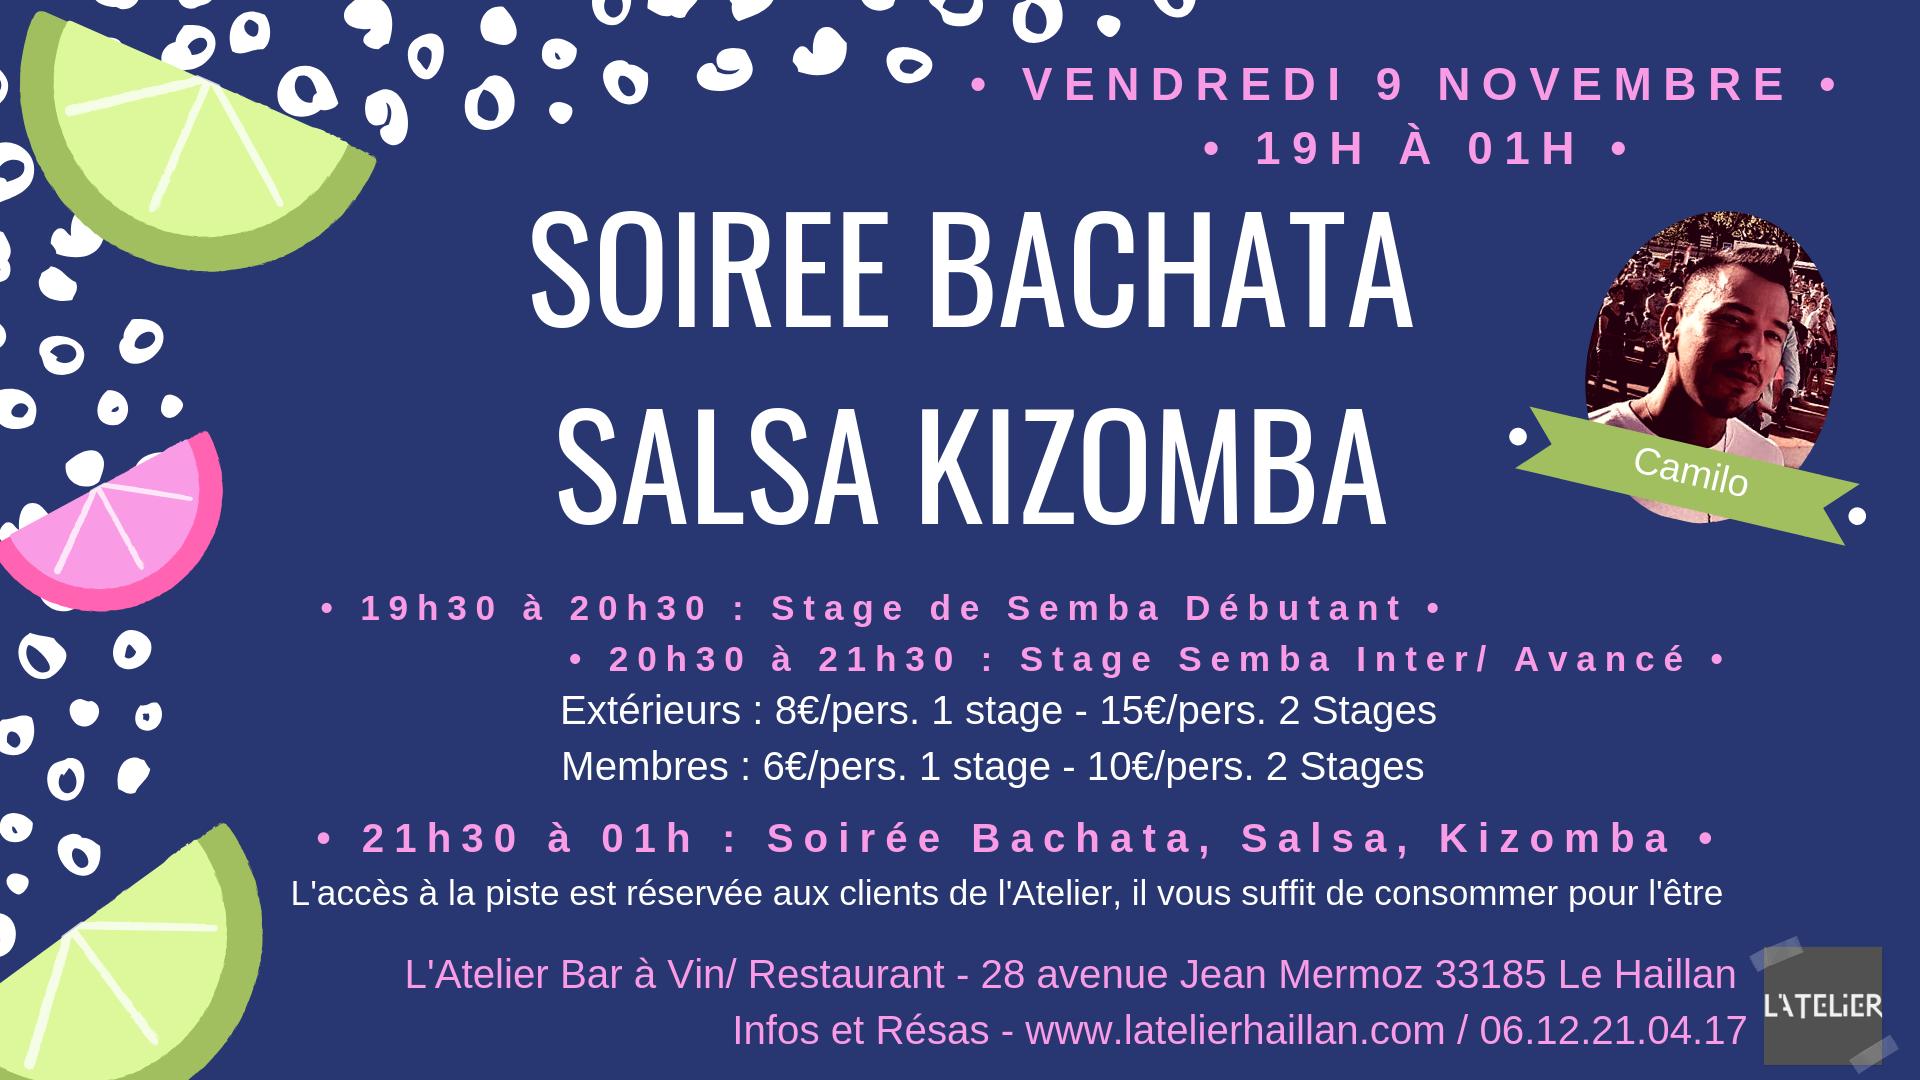 Soirée Salsa, Bachata, Kizomba avec Camilo & 2 Stages de Semba !